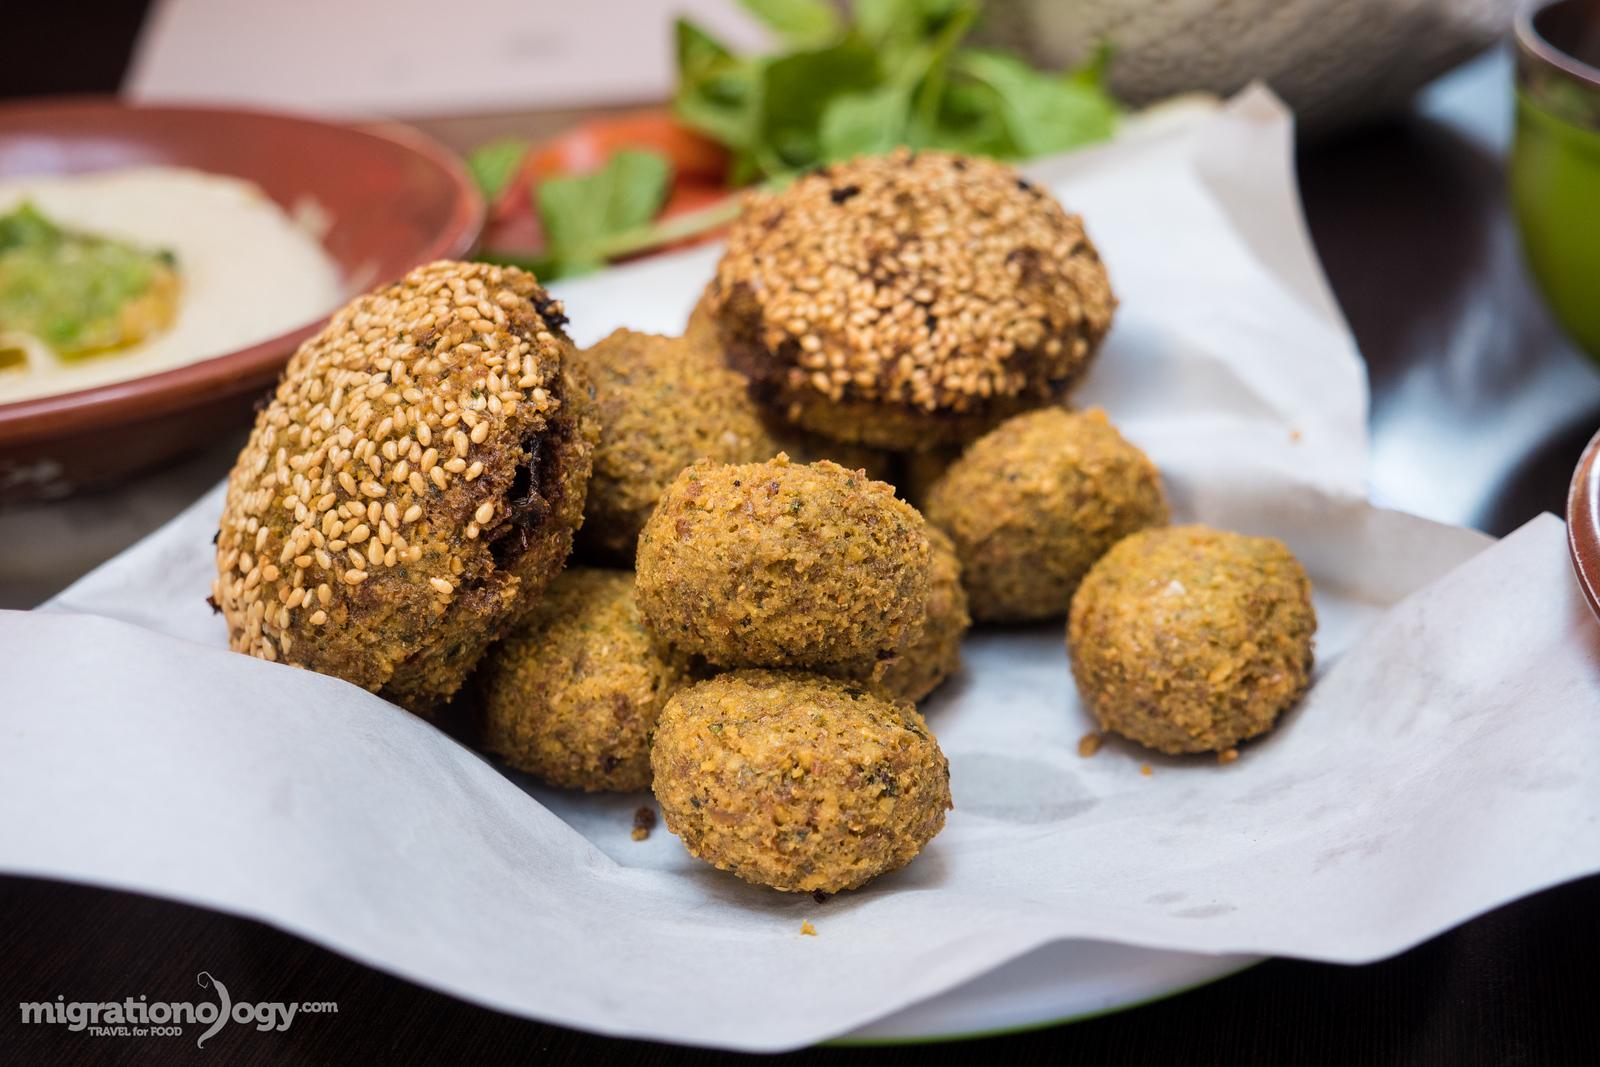 Jordanian falafel